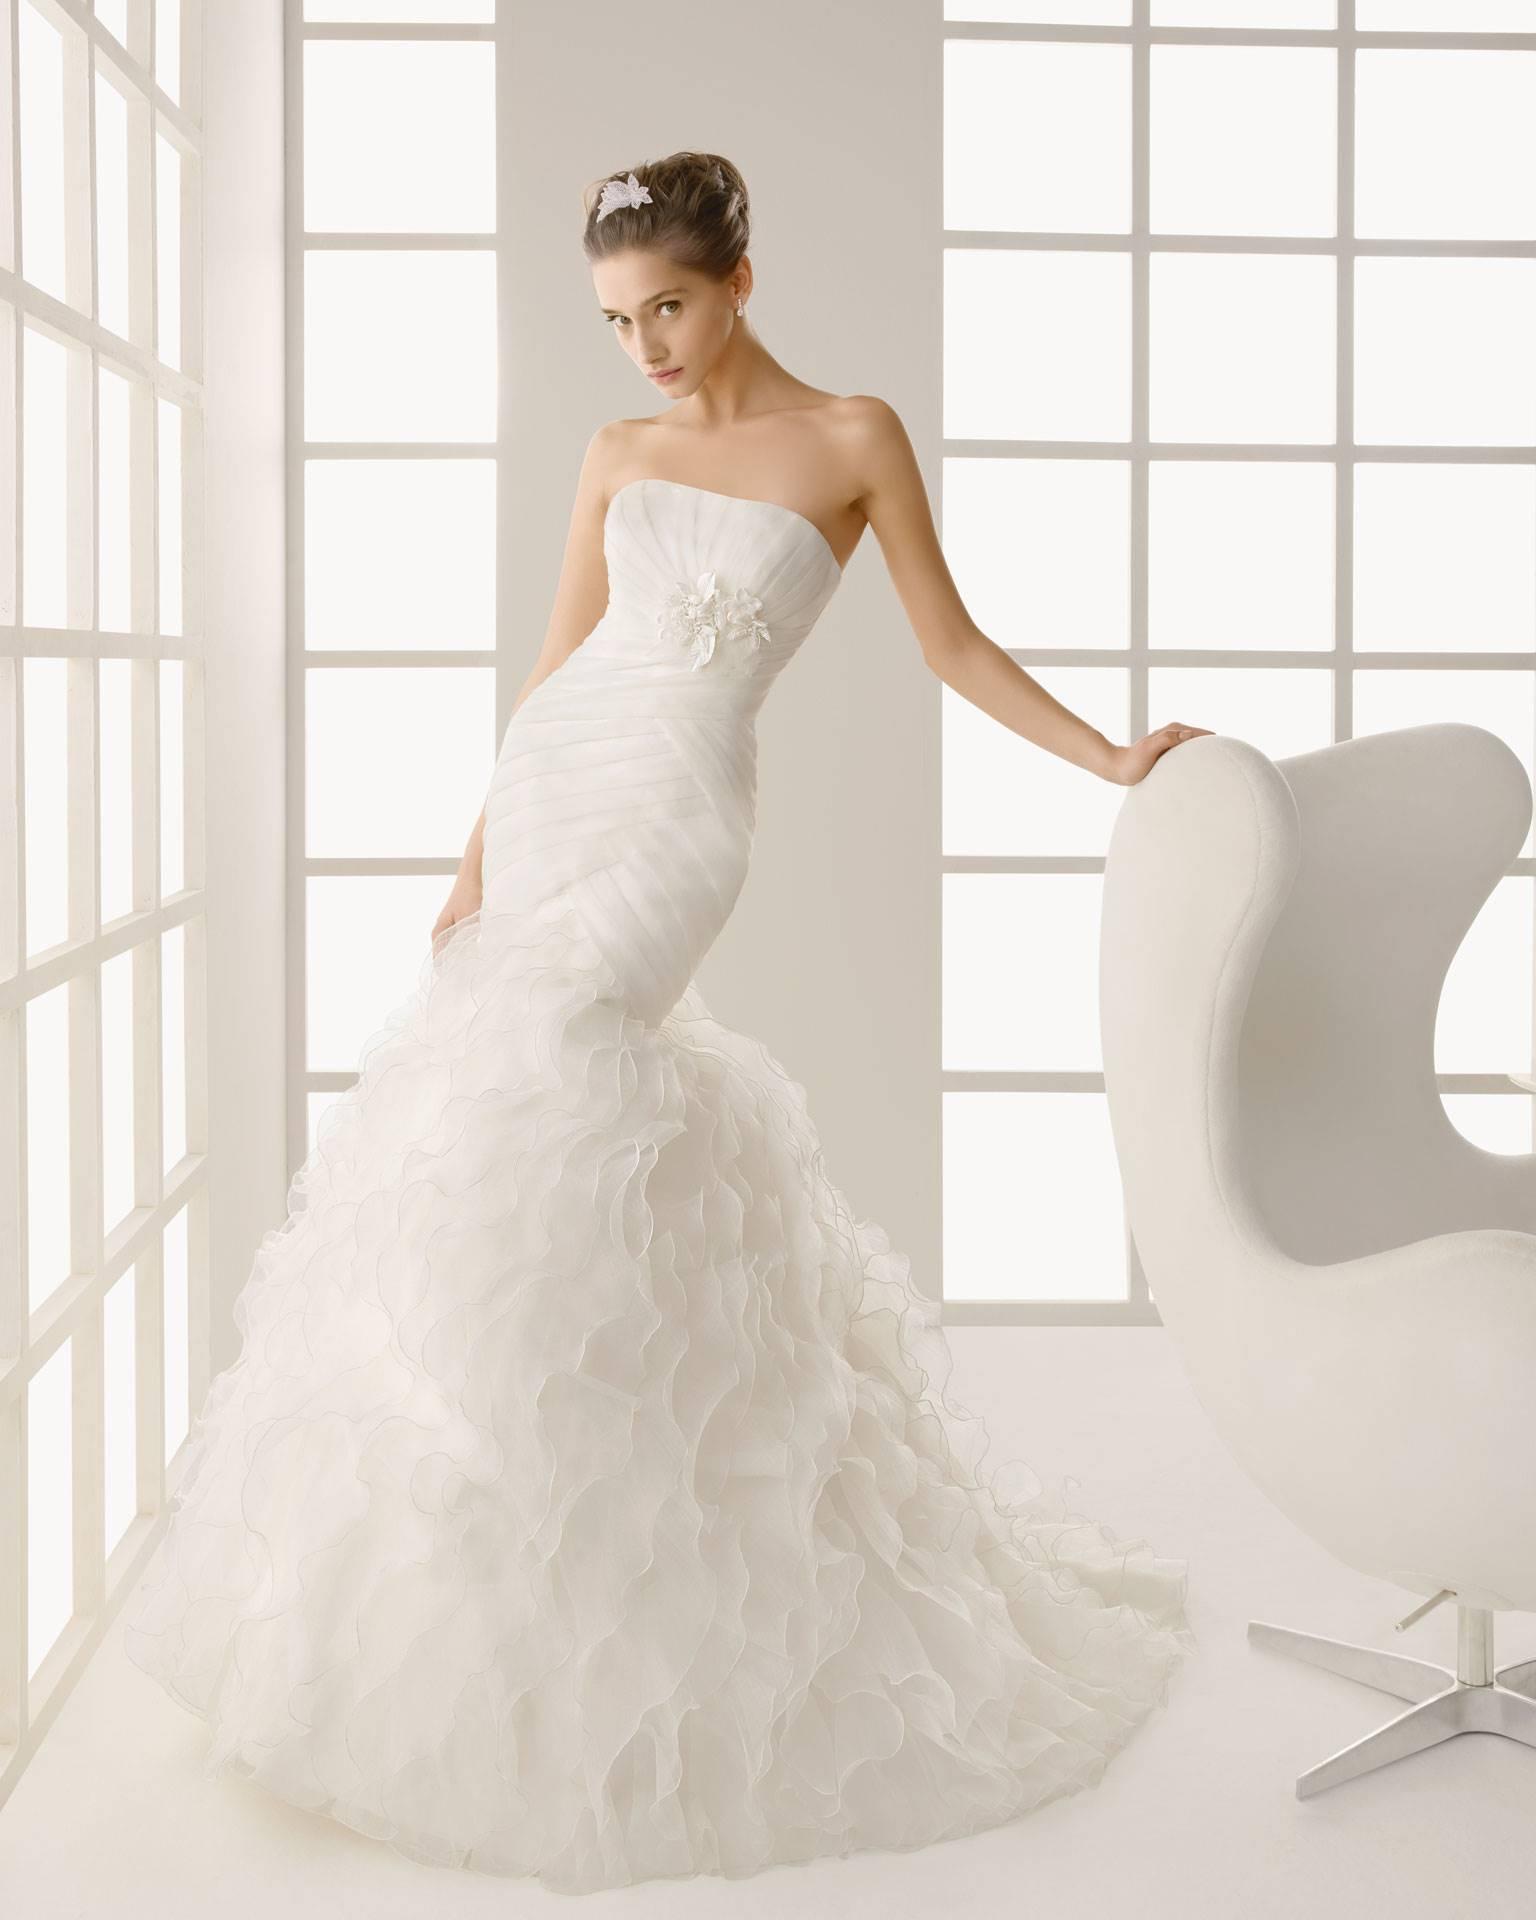 Wedding Saloon :: Свадебное платье Русалочка - Свадебные платья и